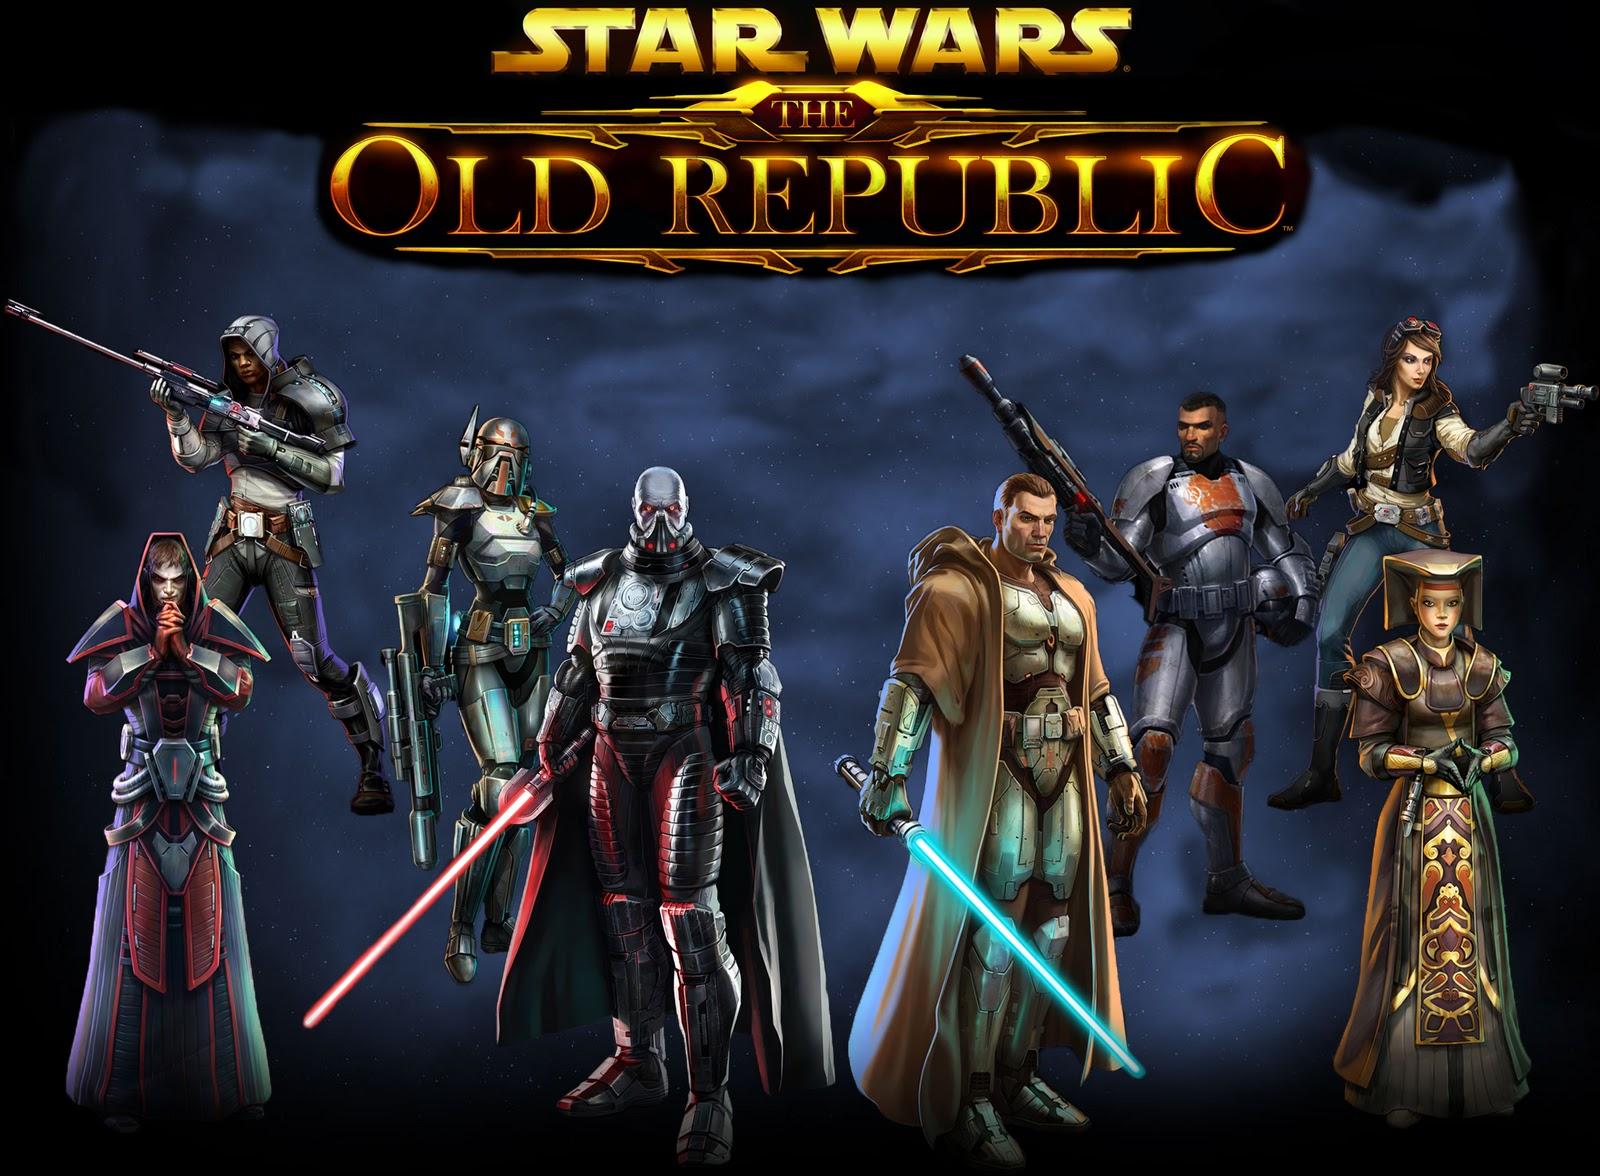 Star wars republic commando order 66 - b2